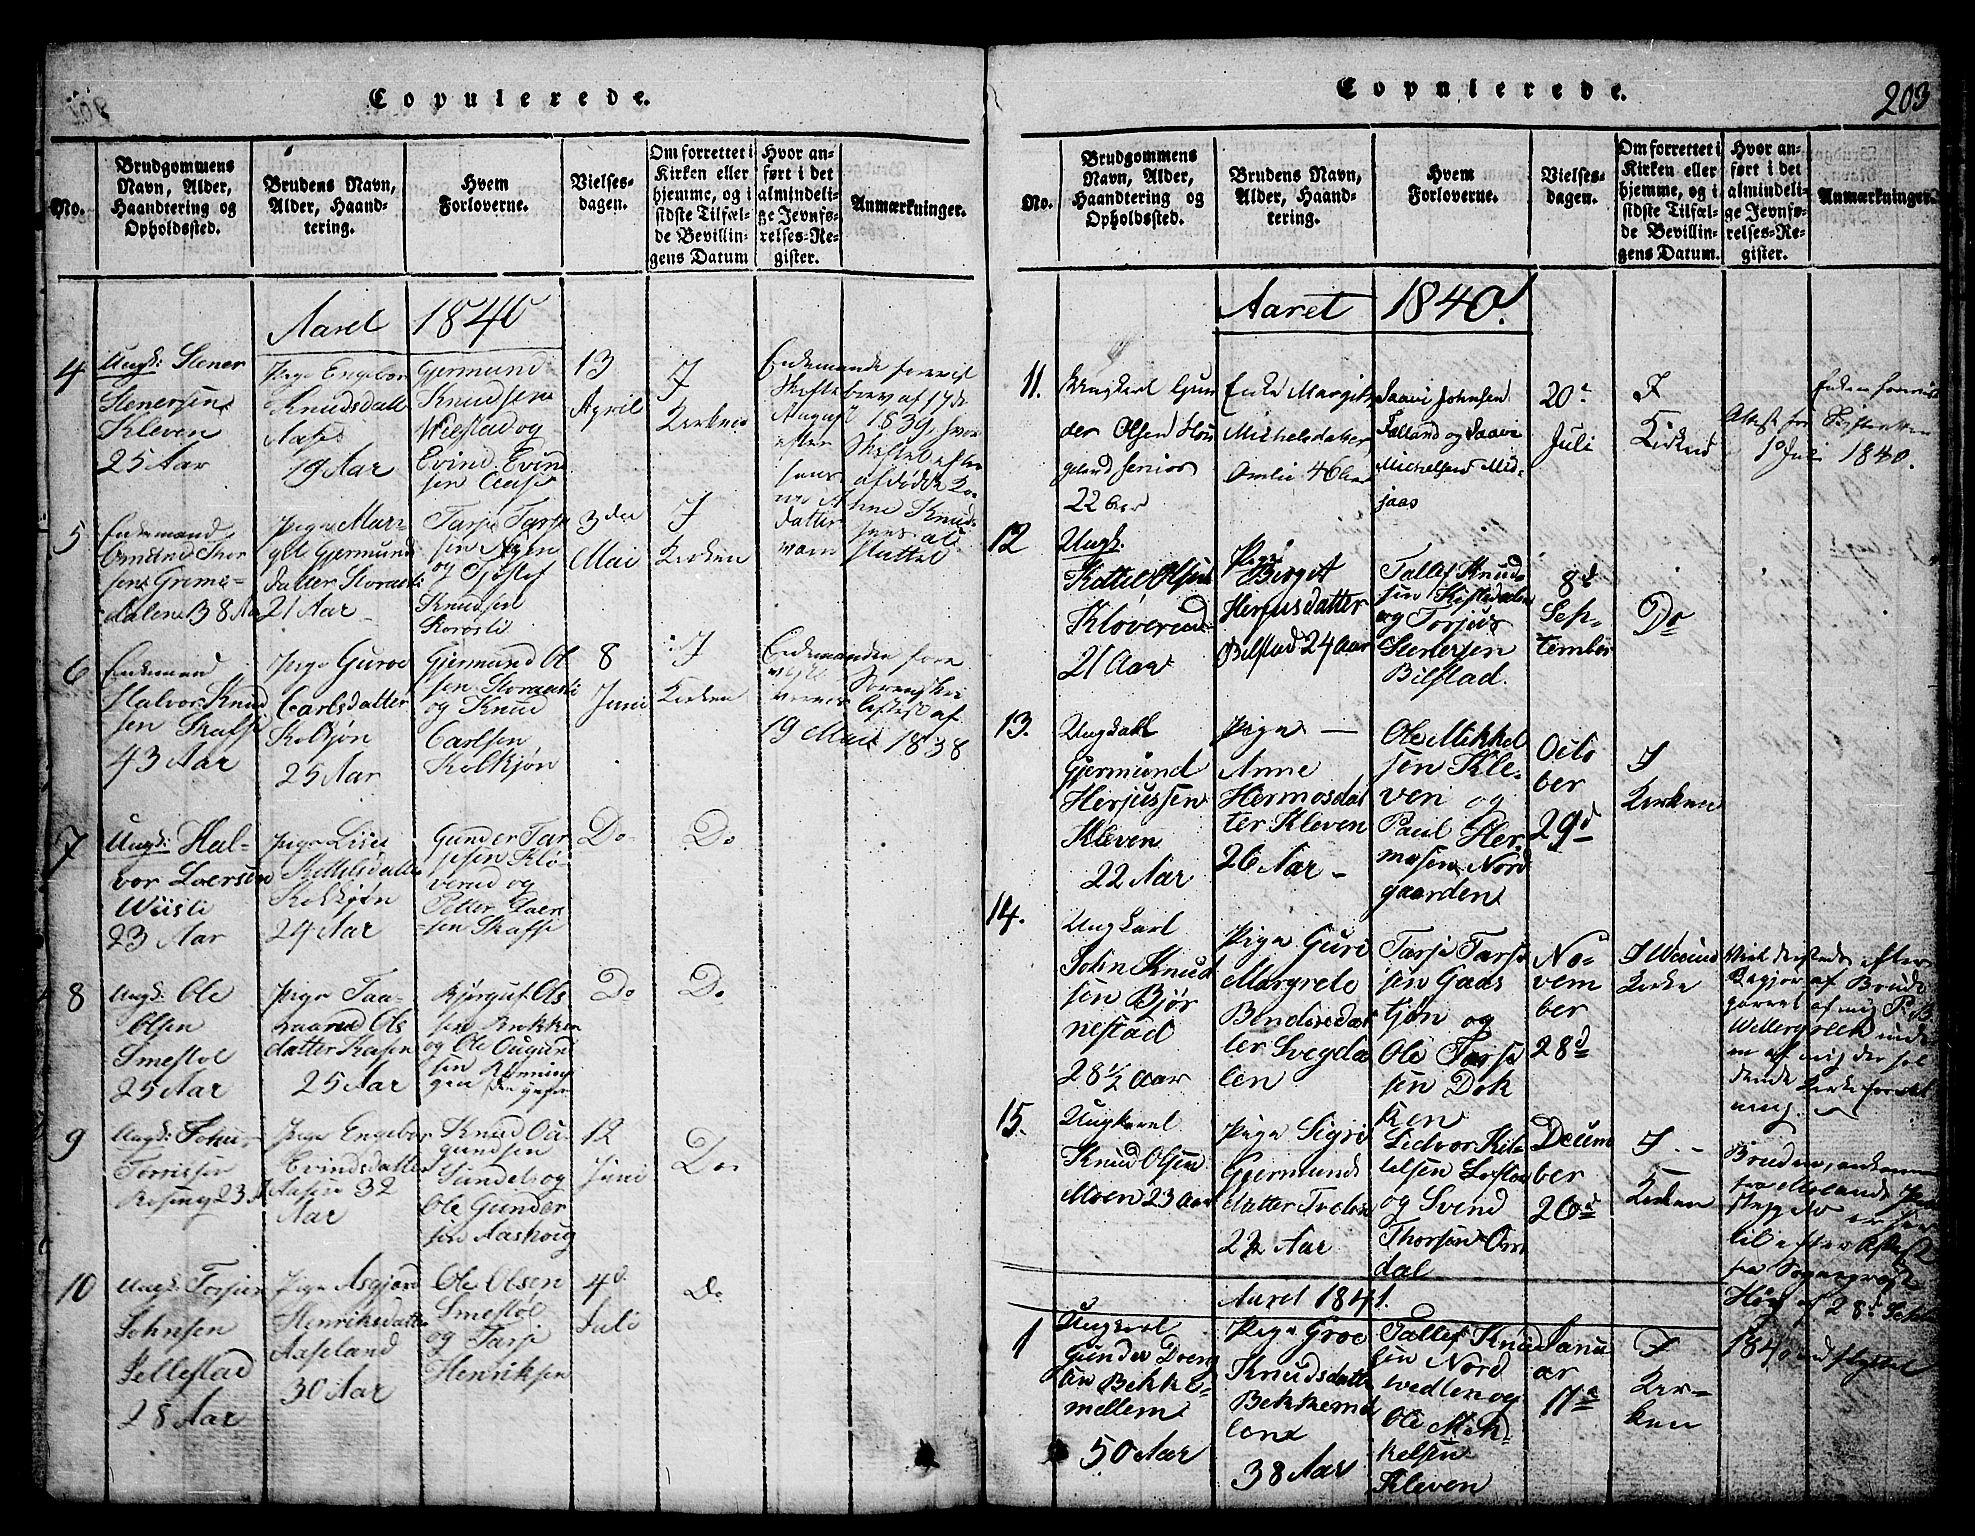 SAKO, Mo kirkebøker, G/Gb/L0001: Klokkerbok nr. II 1, 1814-1843, s. 203